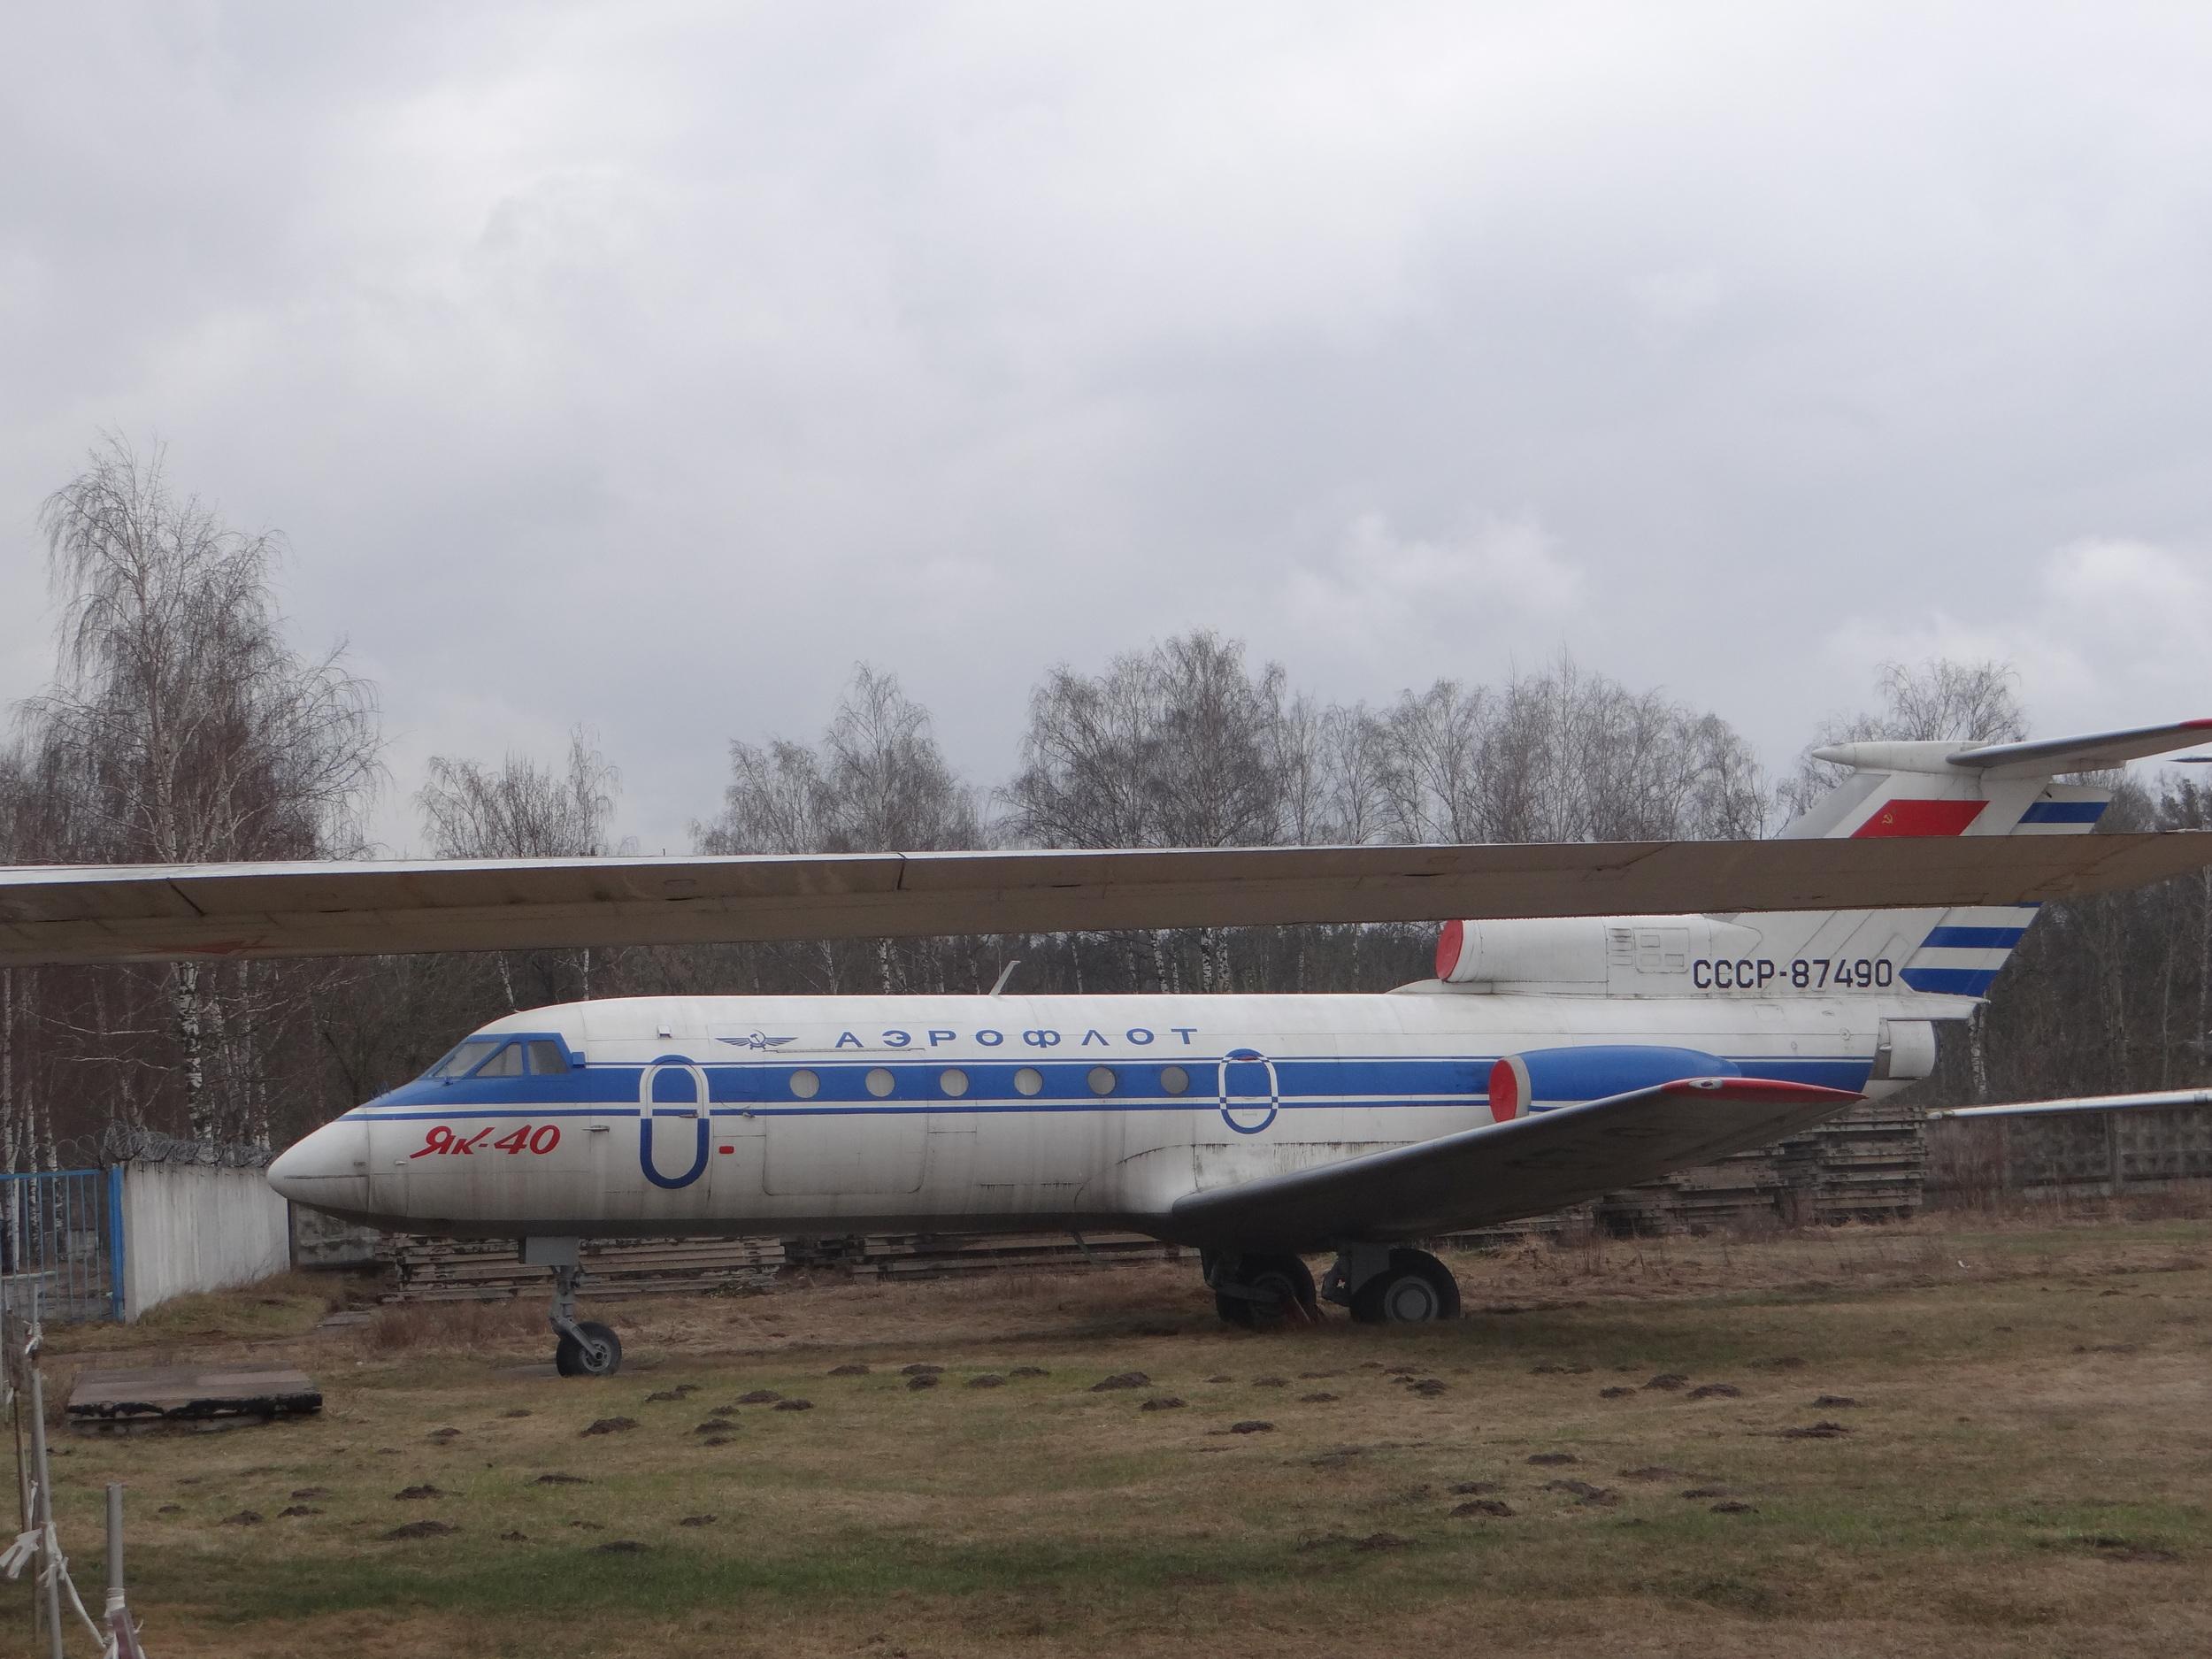 A Yak-40